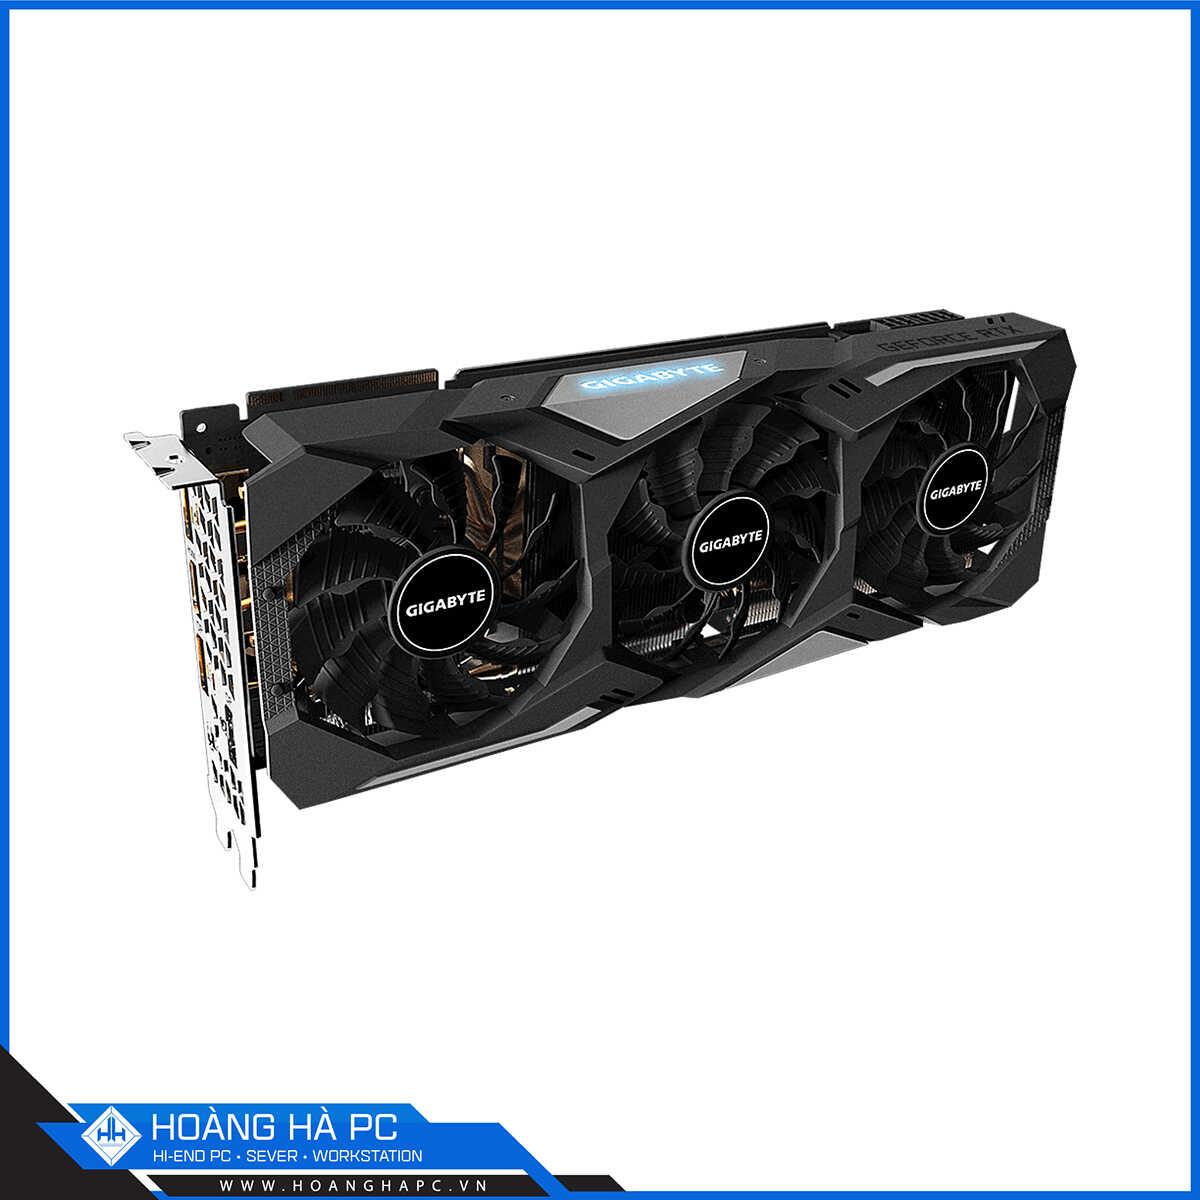 VGA GIGABYE GeForce RTX 2070 SUPER GAMING OC 8G